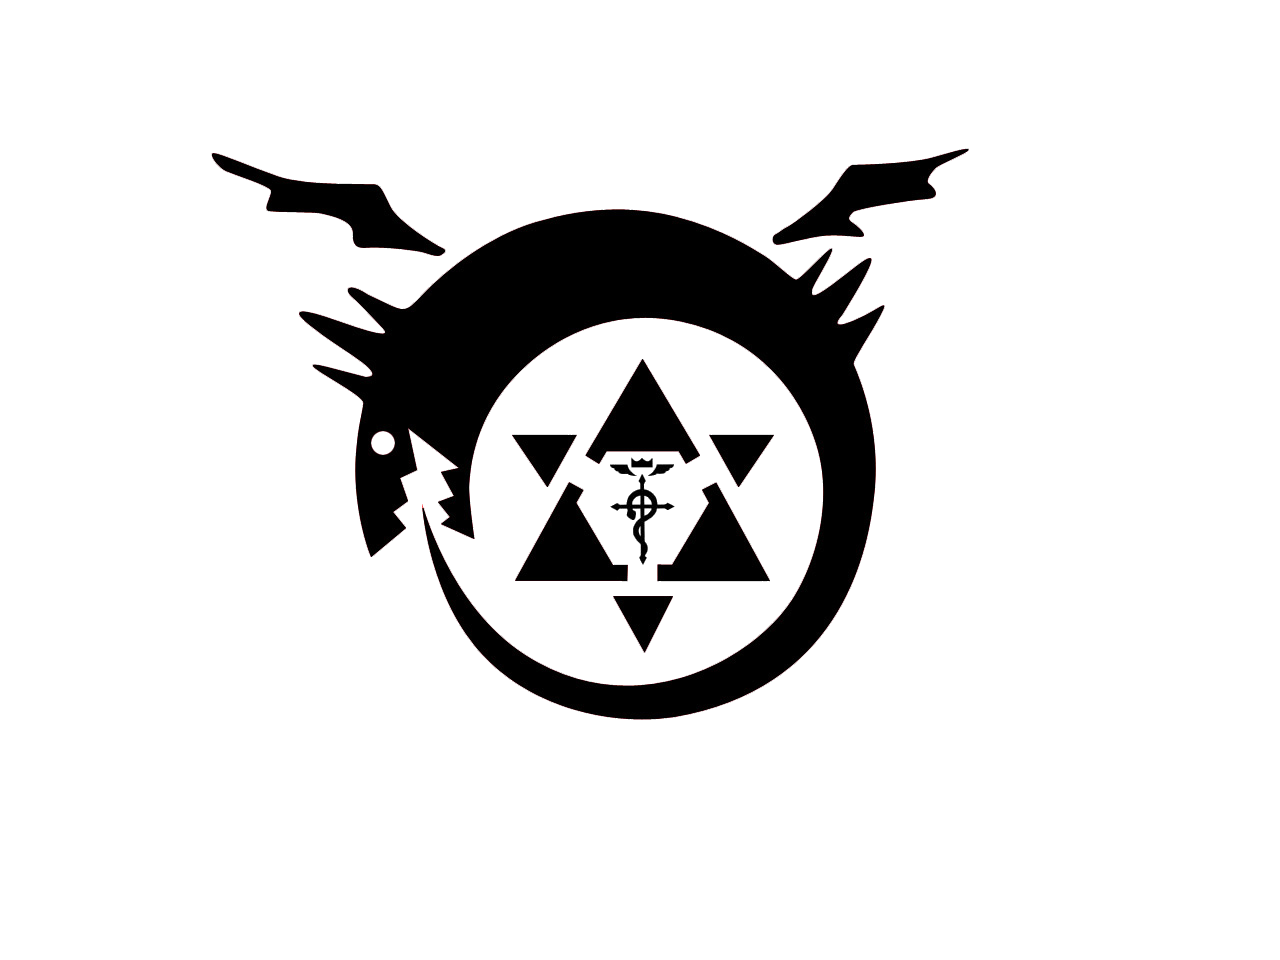 Tattoo  s moreover Gravity Falls Biting Twins 483964437 furthermore Haru Fille Femme Hyb 120387 also Coeur 70486 further Naruto Sage Rain 378795872. on sasuke render